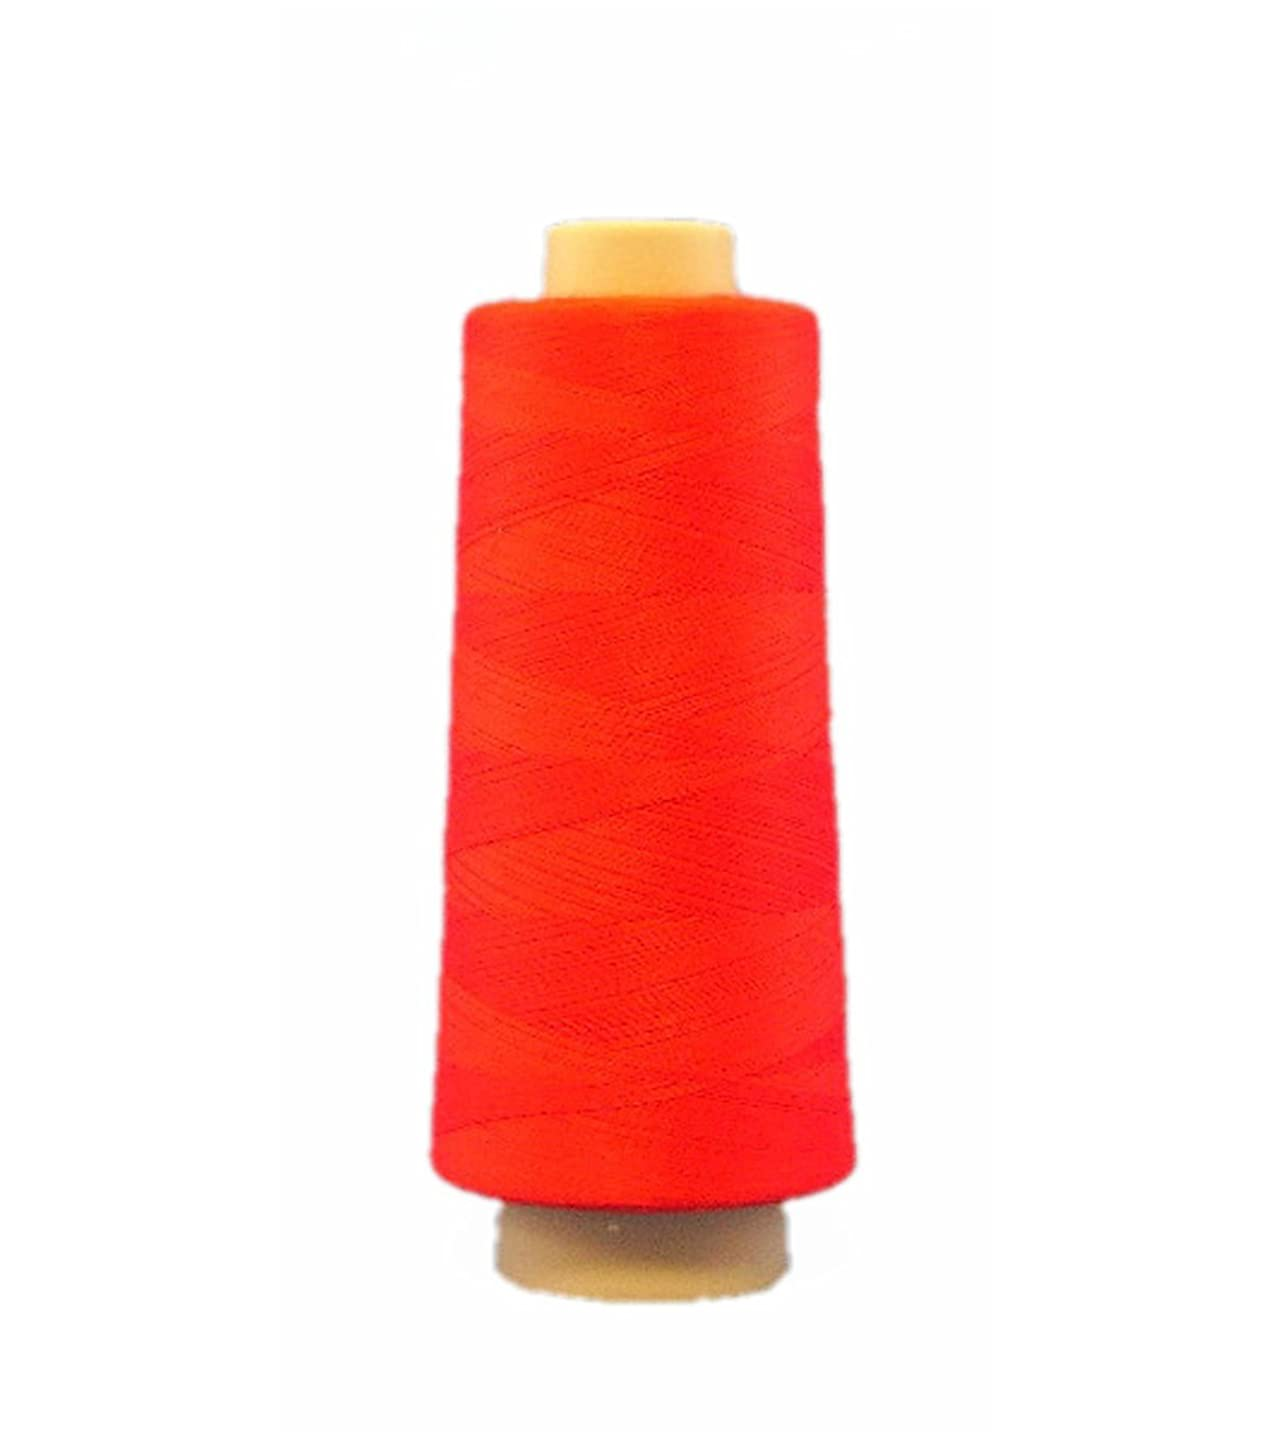 Toldi-Lock Red Overlocking Thread 2500m